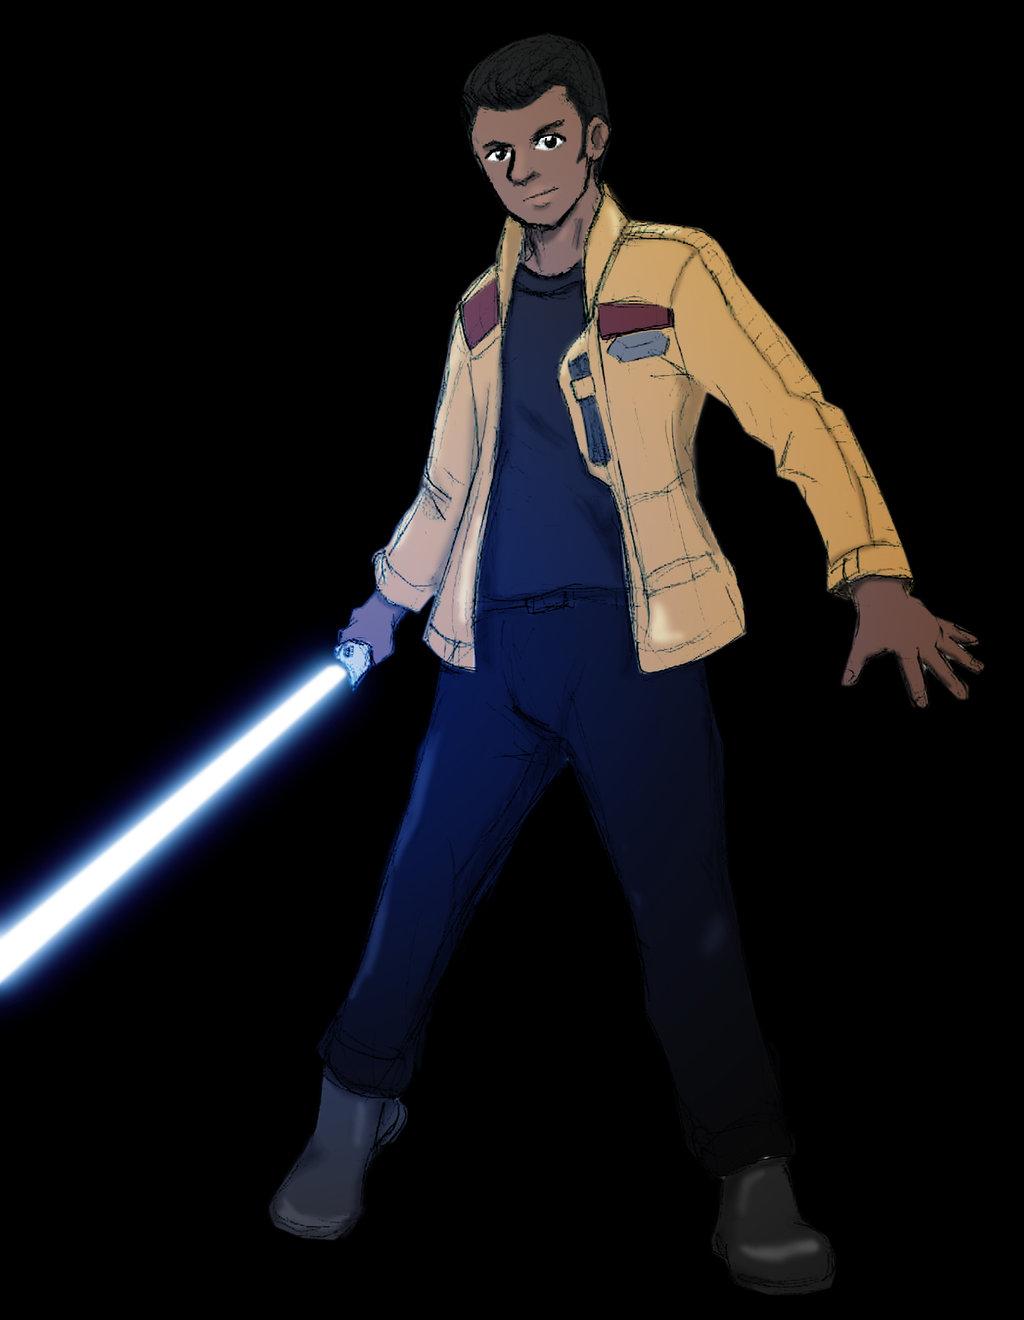 Finn Star Wars The Force Awakens by commanderdad 1024x1320